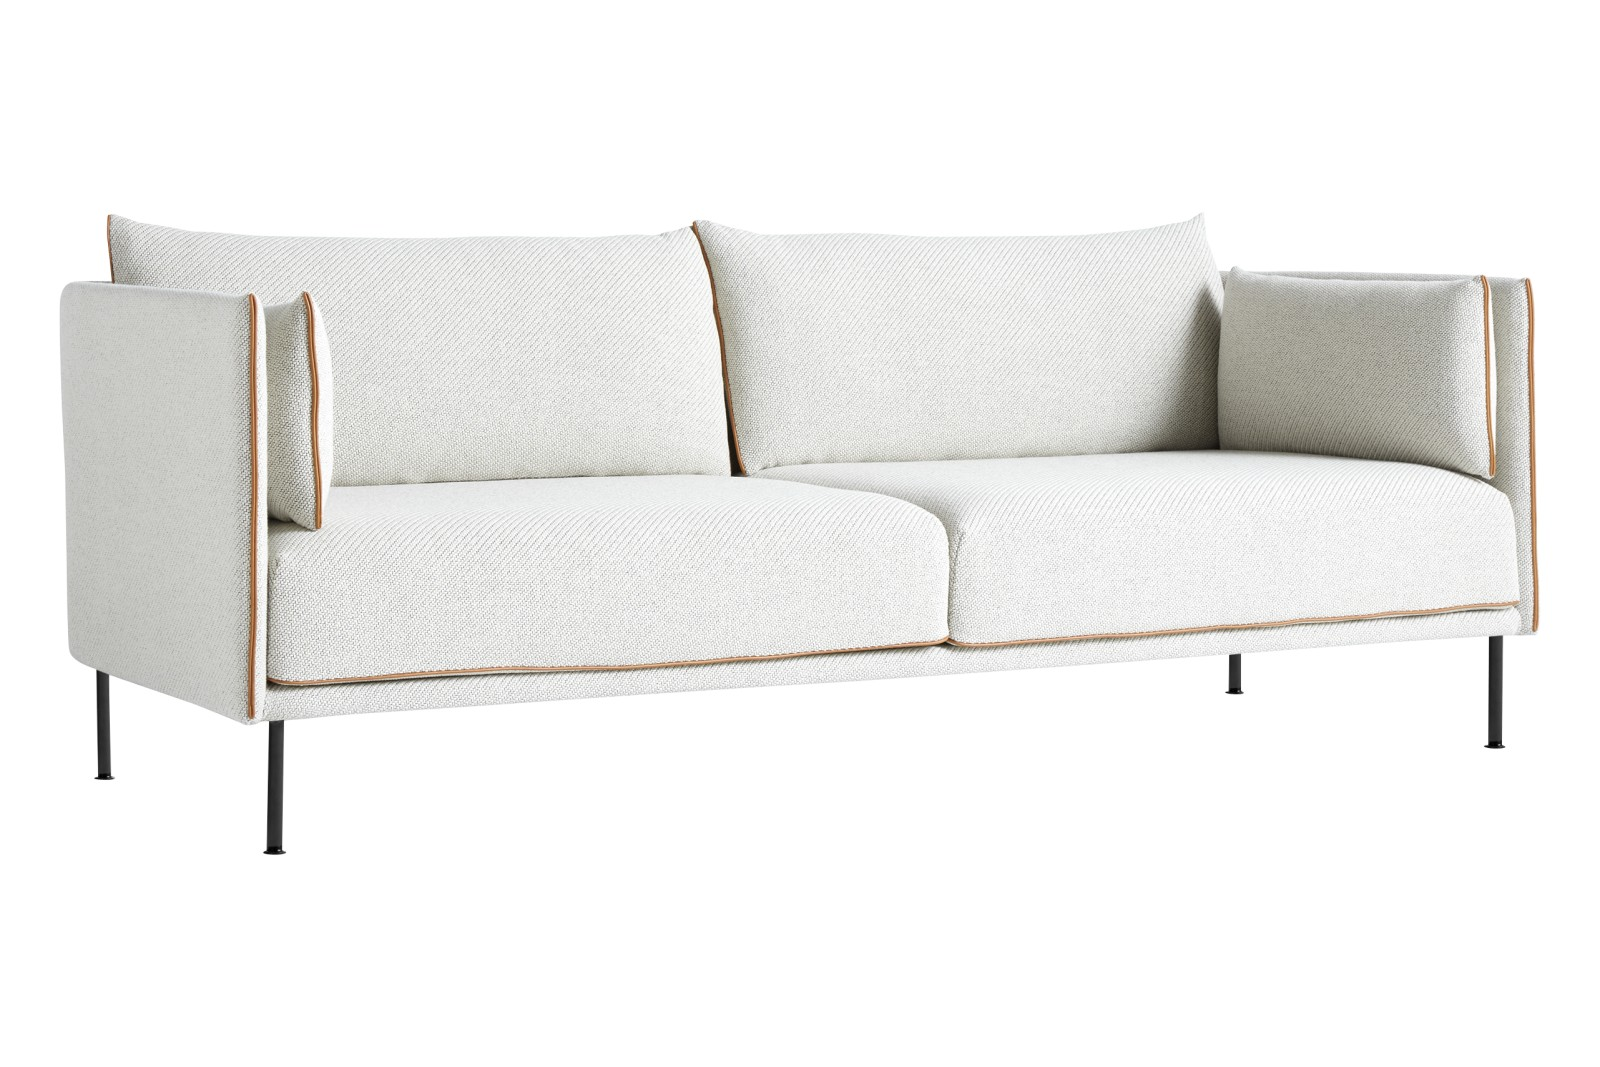 Silhouette 3 Seater Mono Sofa Fabric Group 5, Leather Cognac, Metal Black